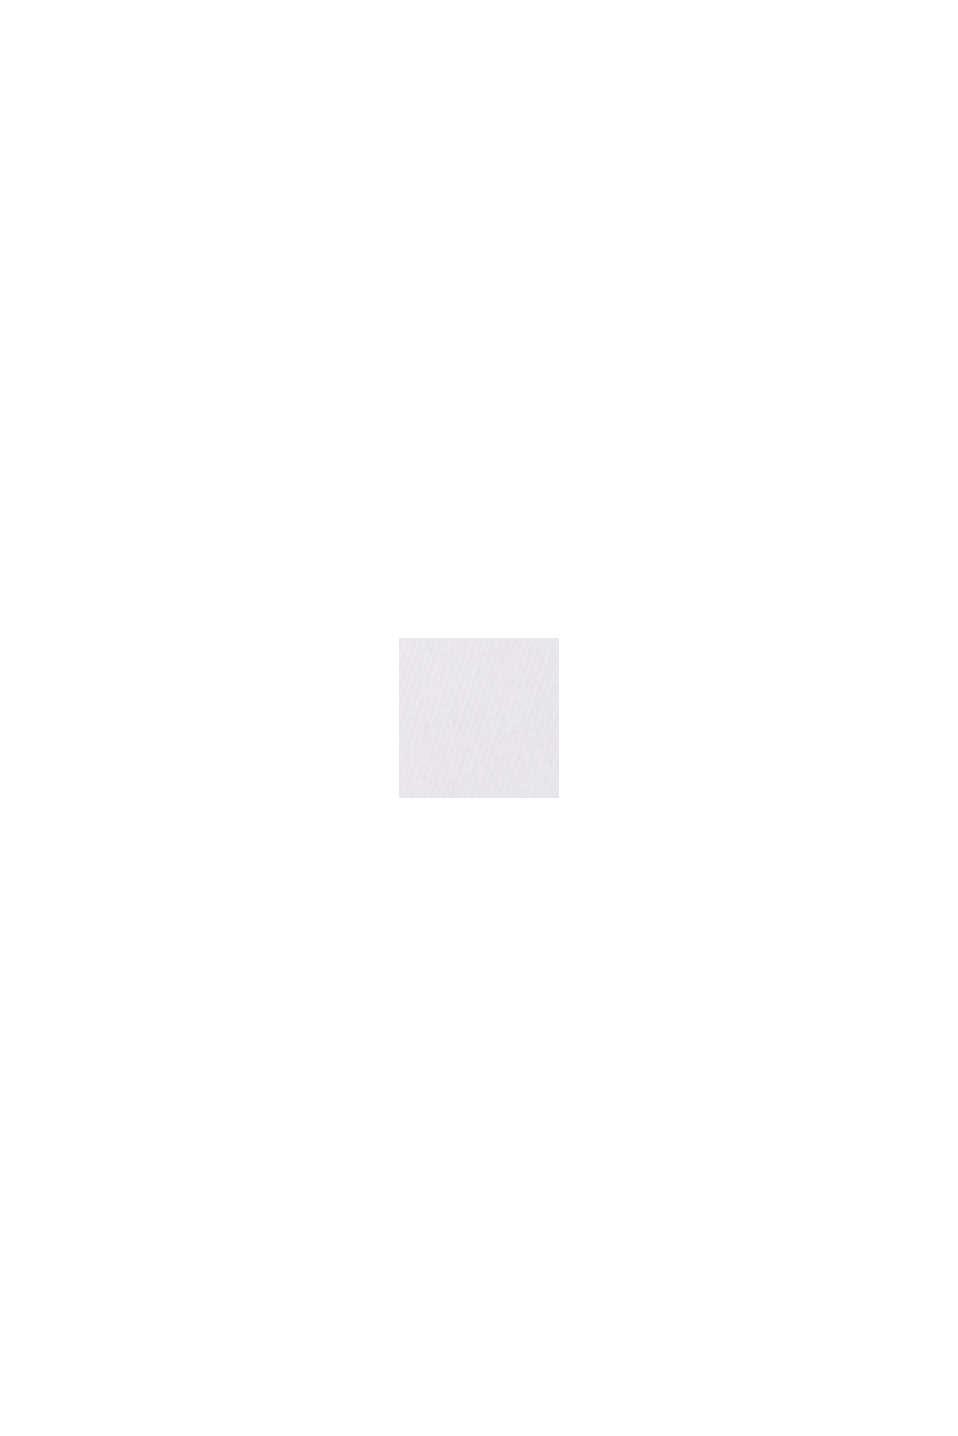 CURVY logoshirt met stras, biologisch katoen, WHITE, swatch